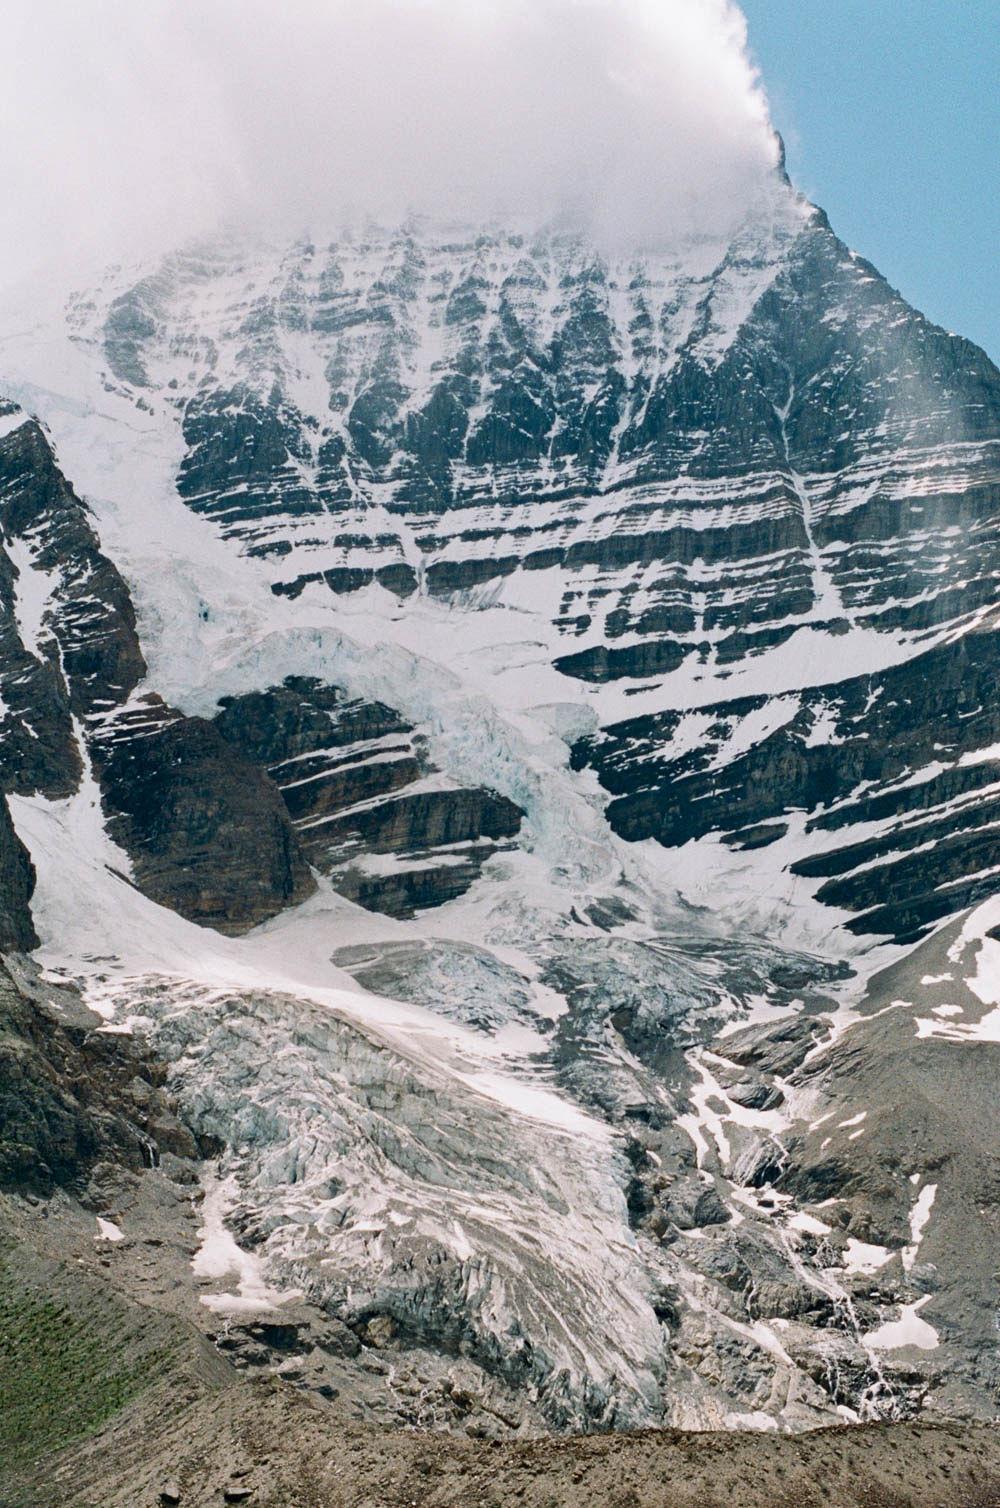 © Cottage Hill, LLC | cottagehill.co | Canadian Rockies22.jpg